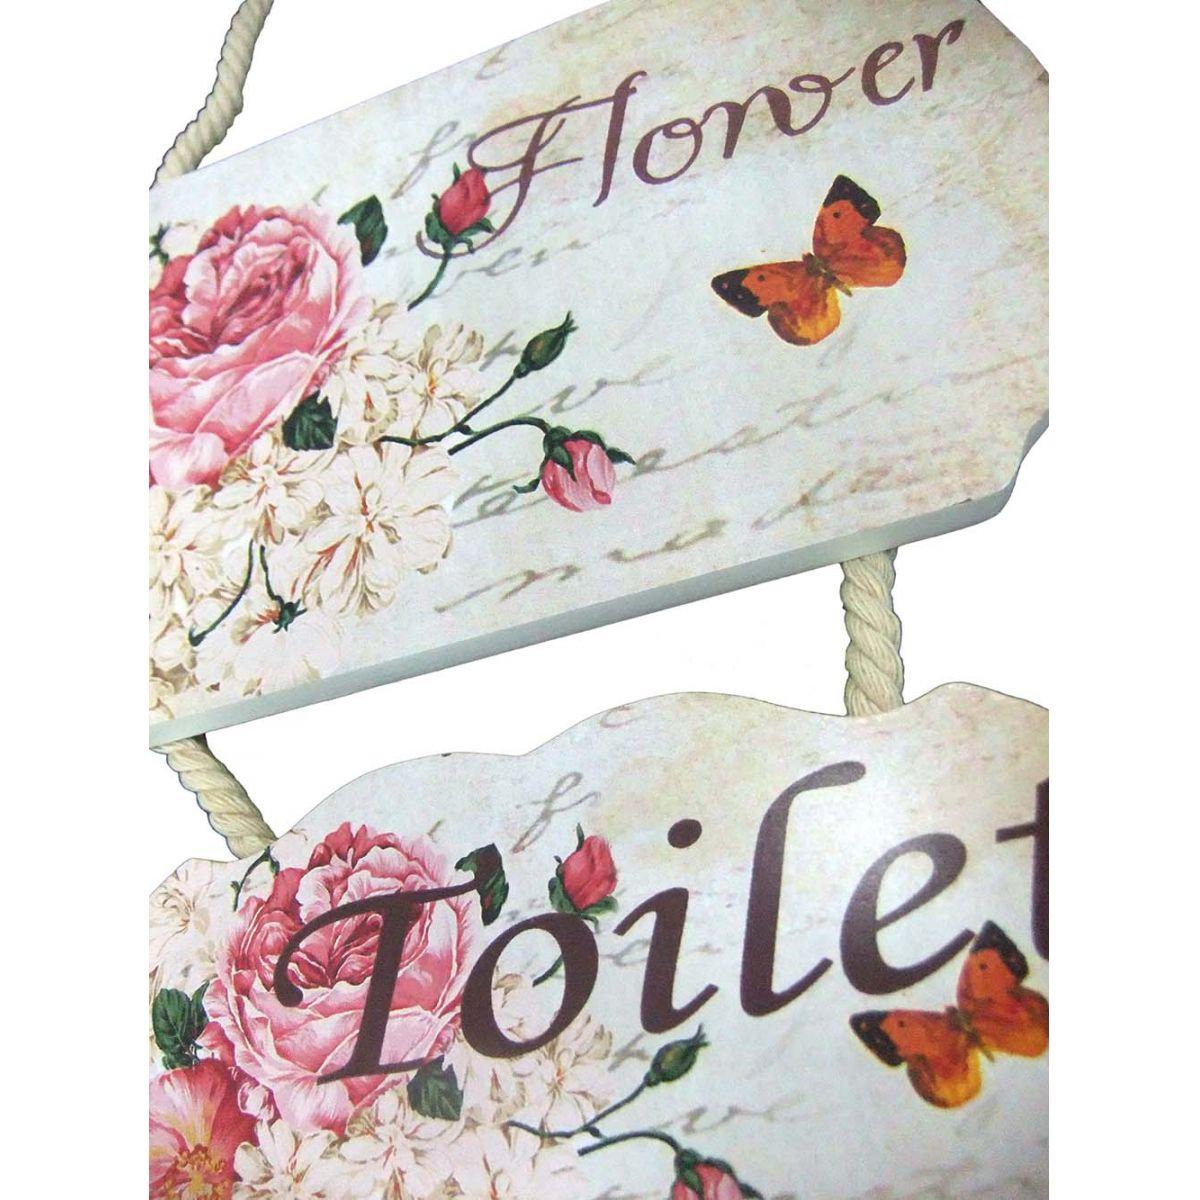 Placa Sanitario Banheiro Indica Enfeite Toilete Madeira Mulher (MAD-6702-15)